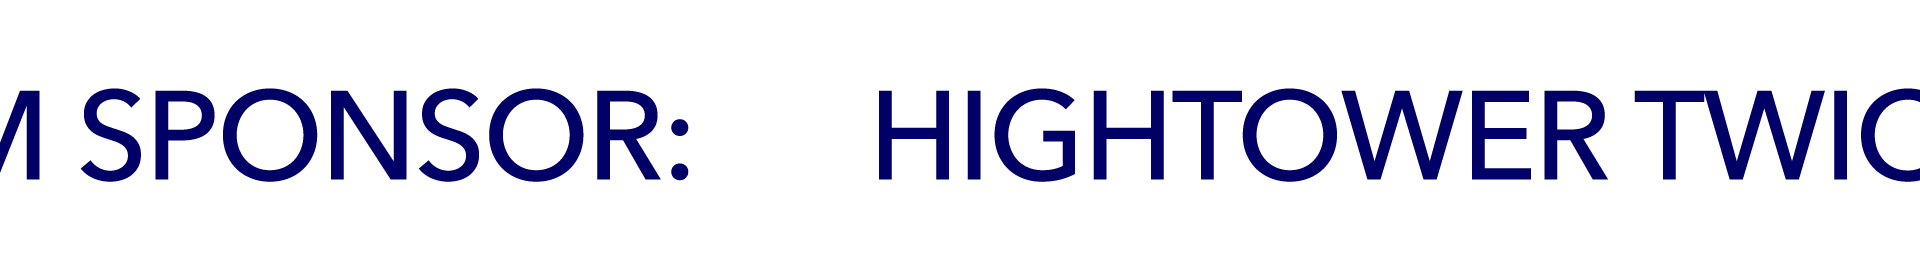 1 - Platinum - Hightower.png